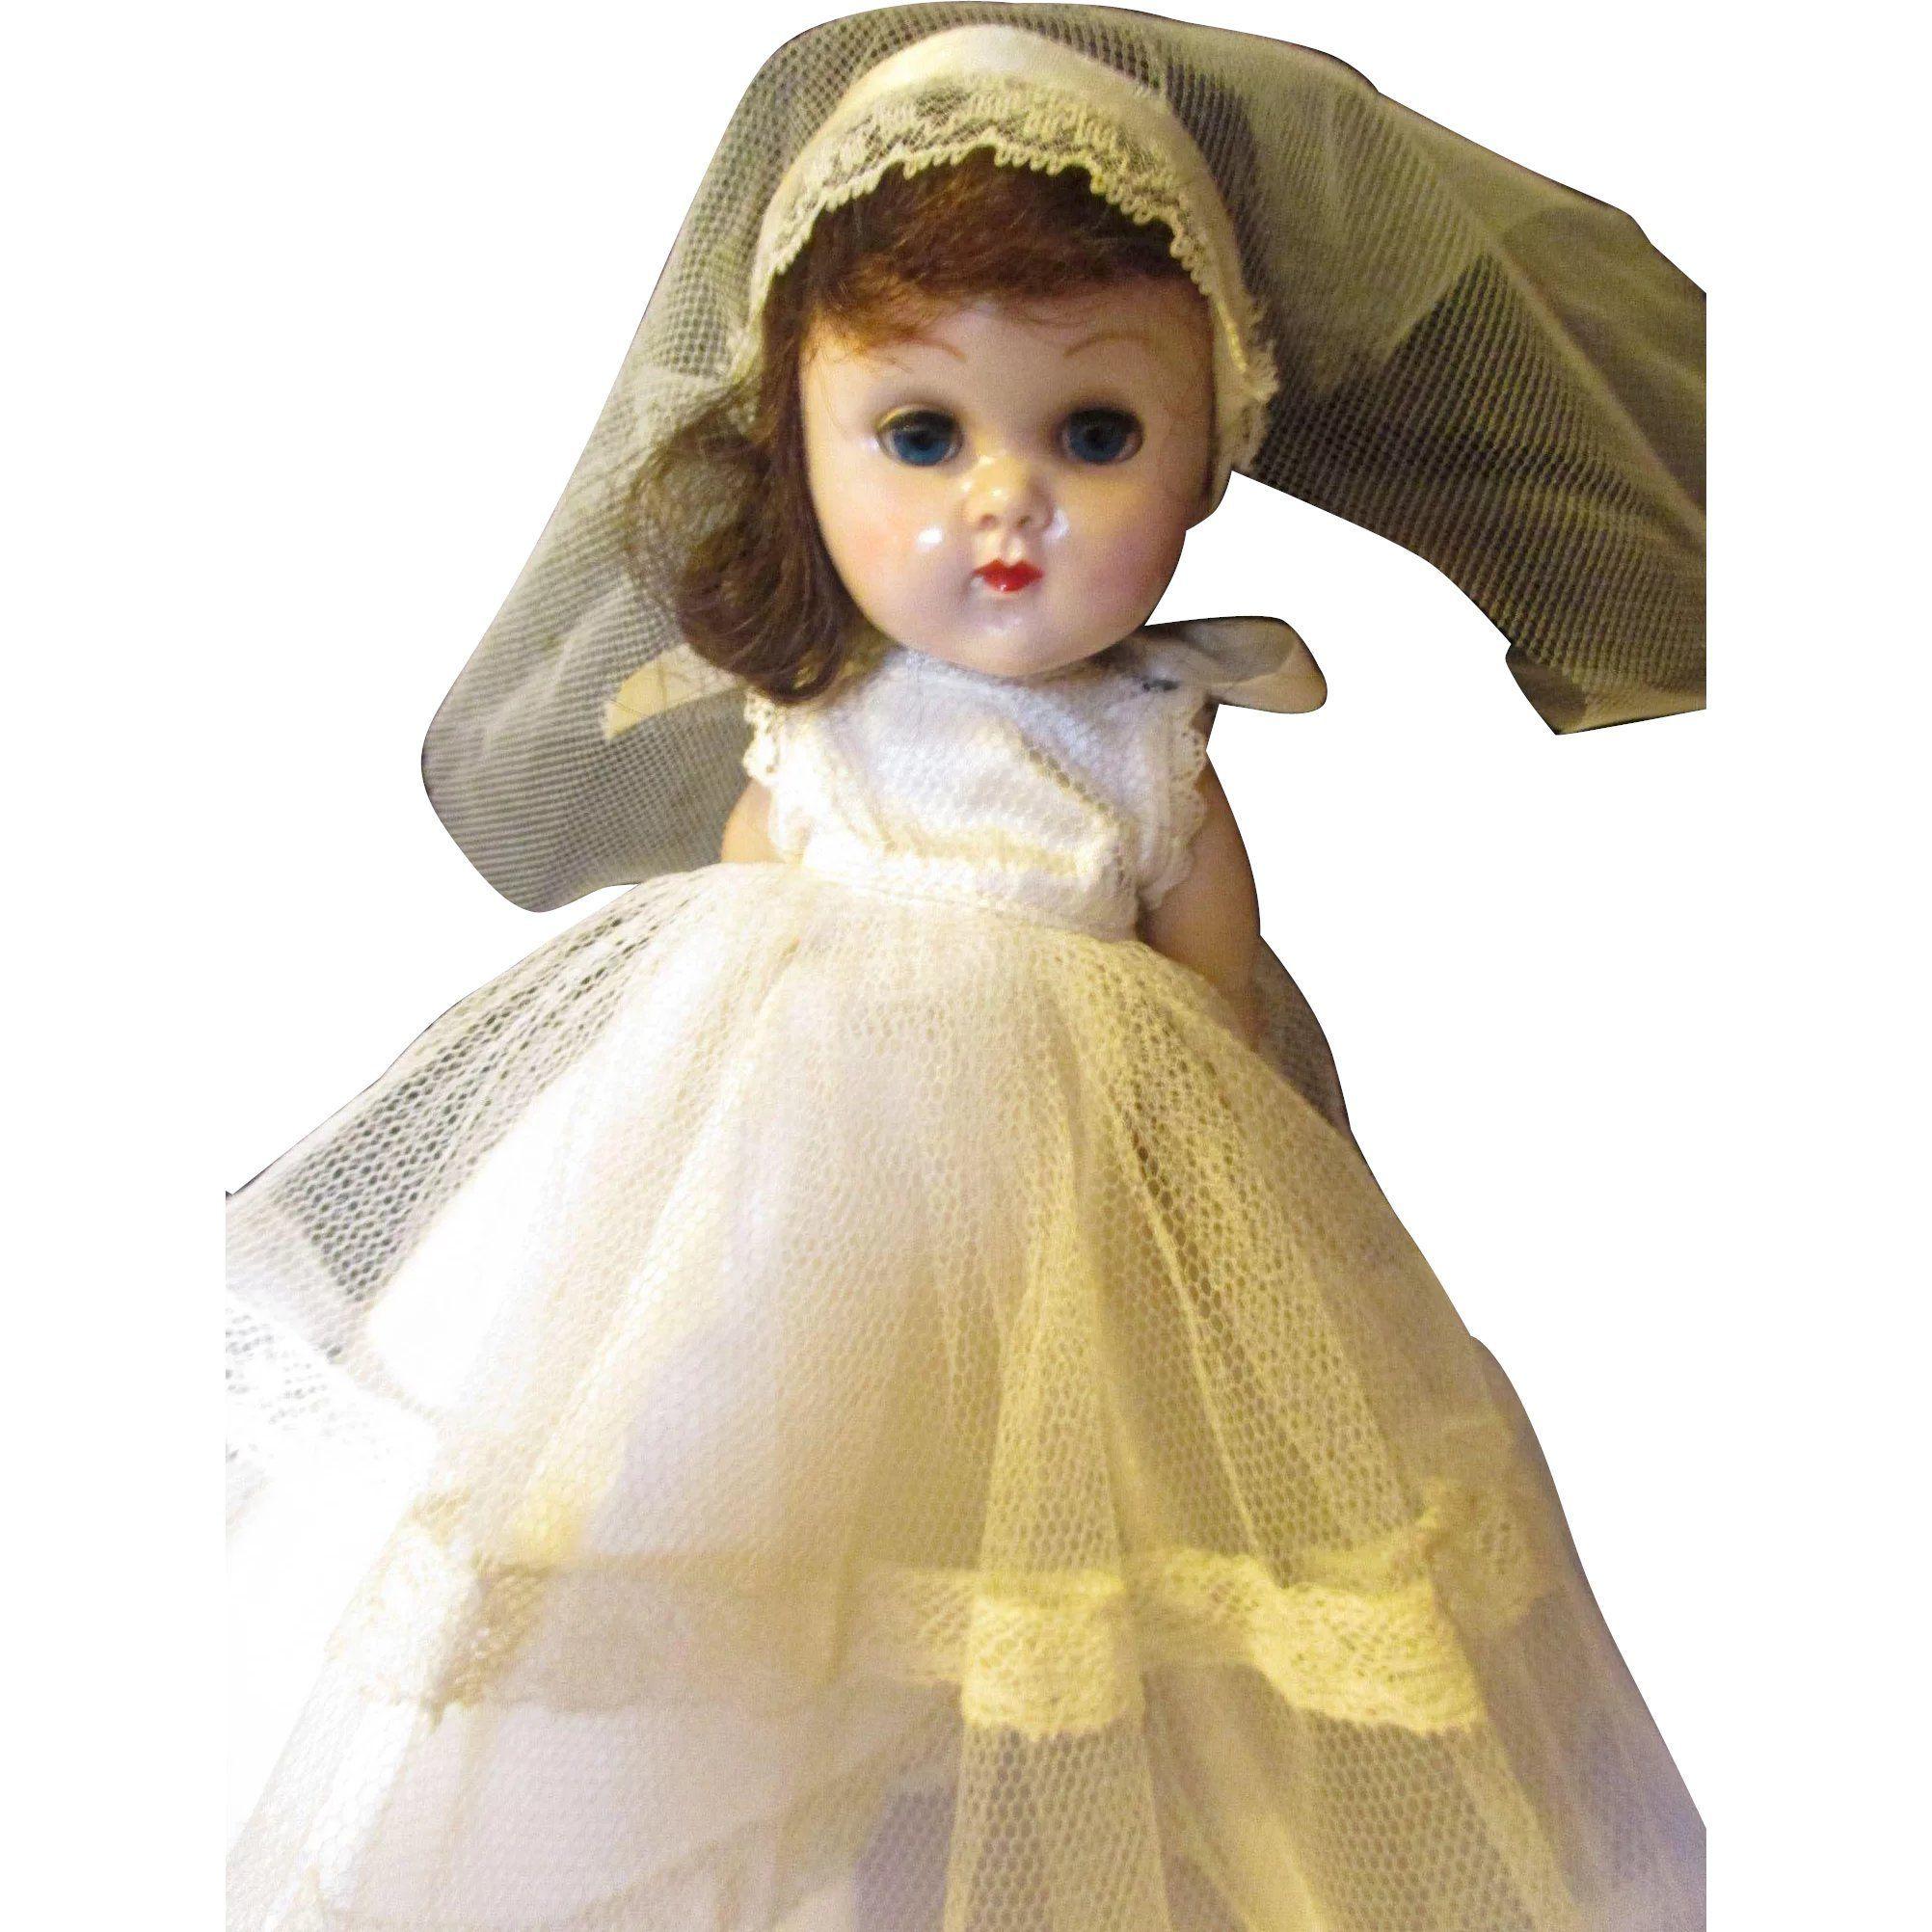 Vintage Vogue/Ginny Bride doll SLW #bridedolls Vintage Vogue/Ginny Bride doll SLW -- found at www.rubylane.com #thedollworldshome #vintagebeginshere #bride #doll #giftsforher #valentinesday #bridedolls